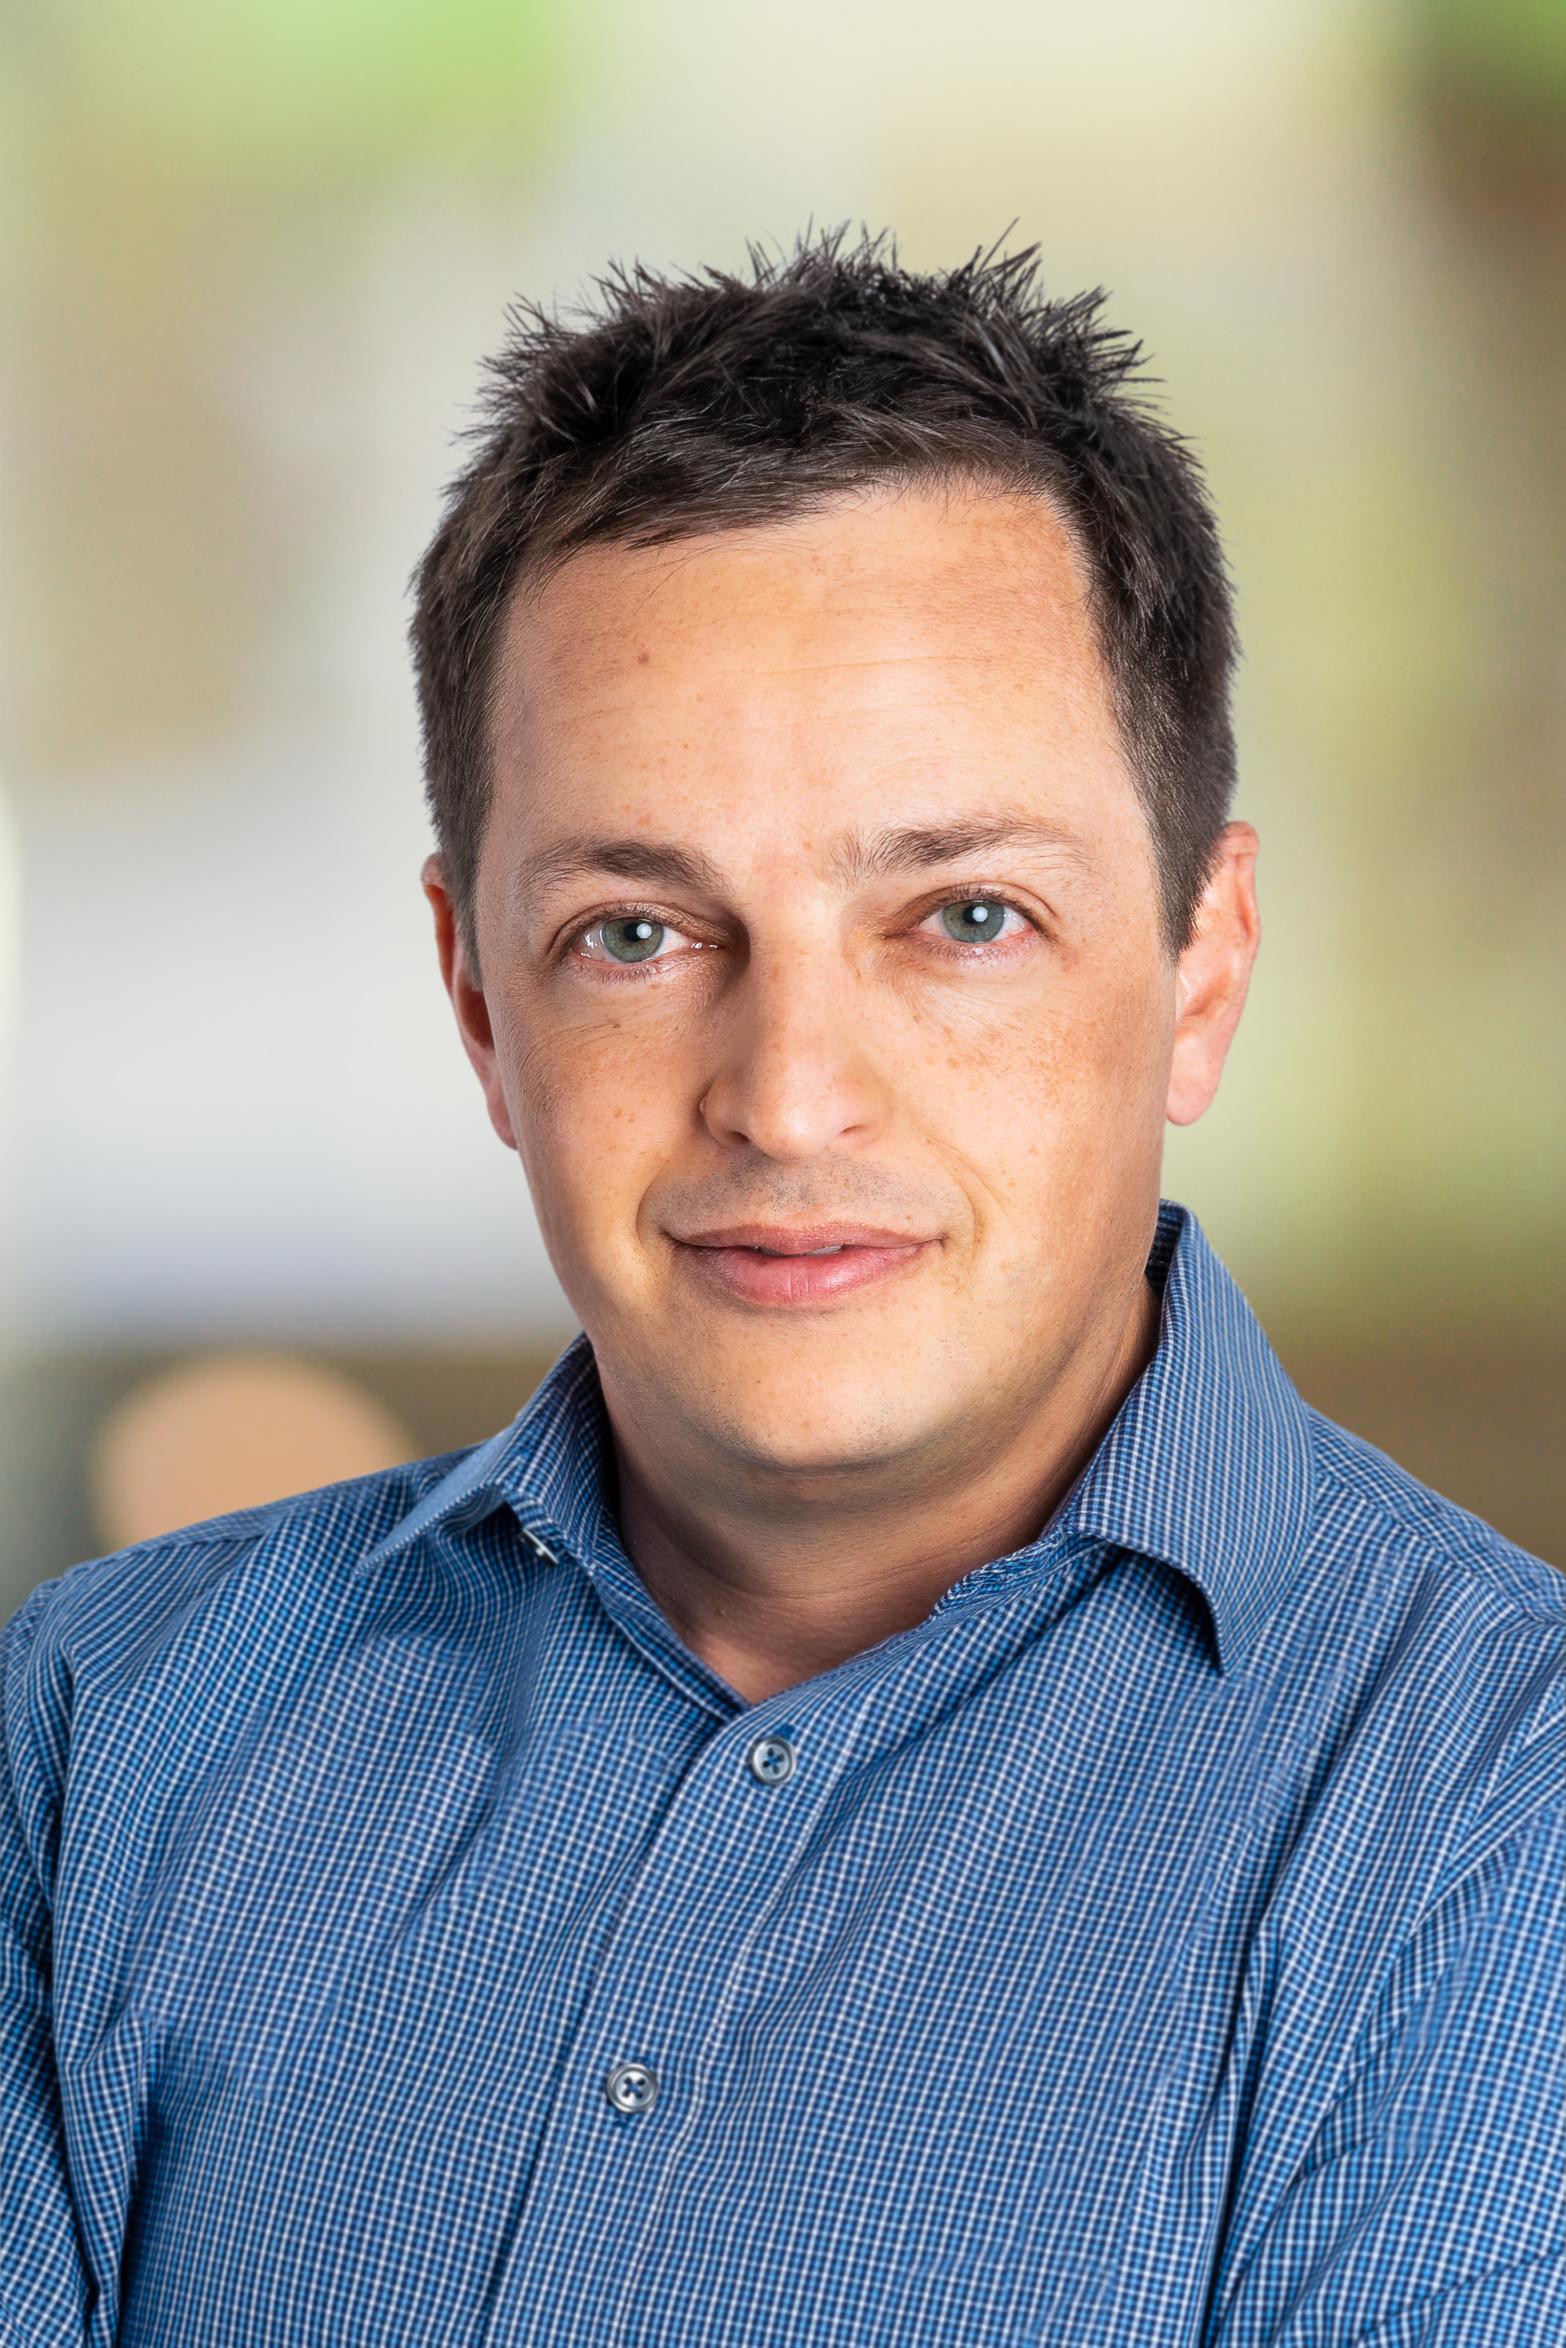 Christian Kleinerman